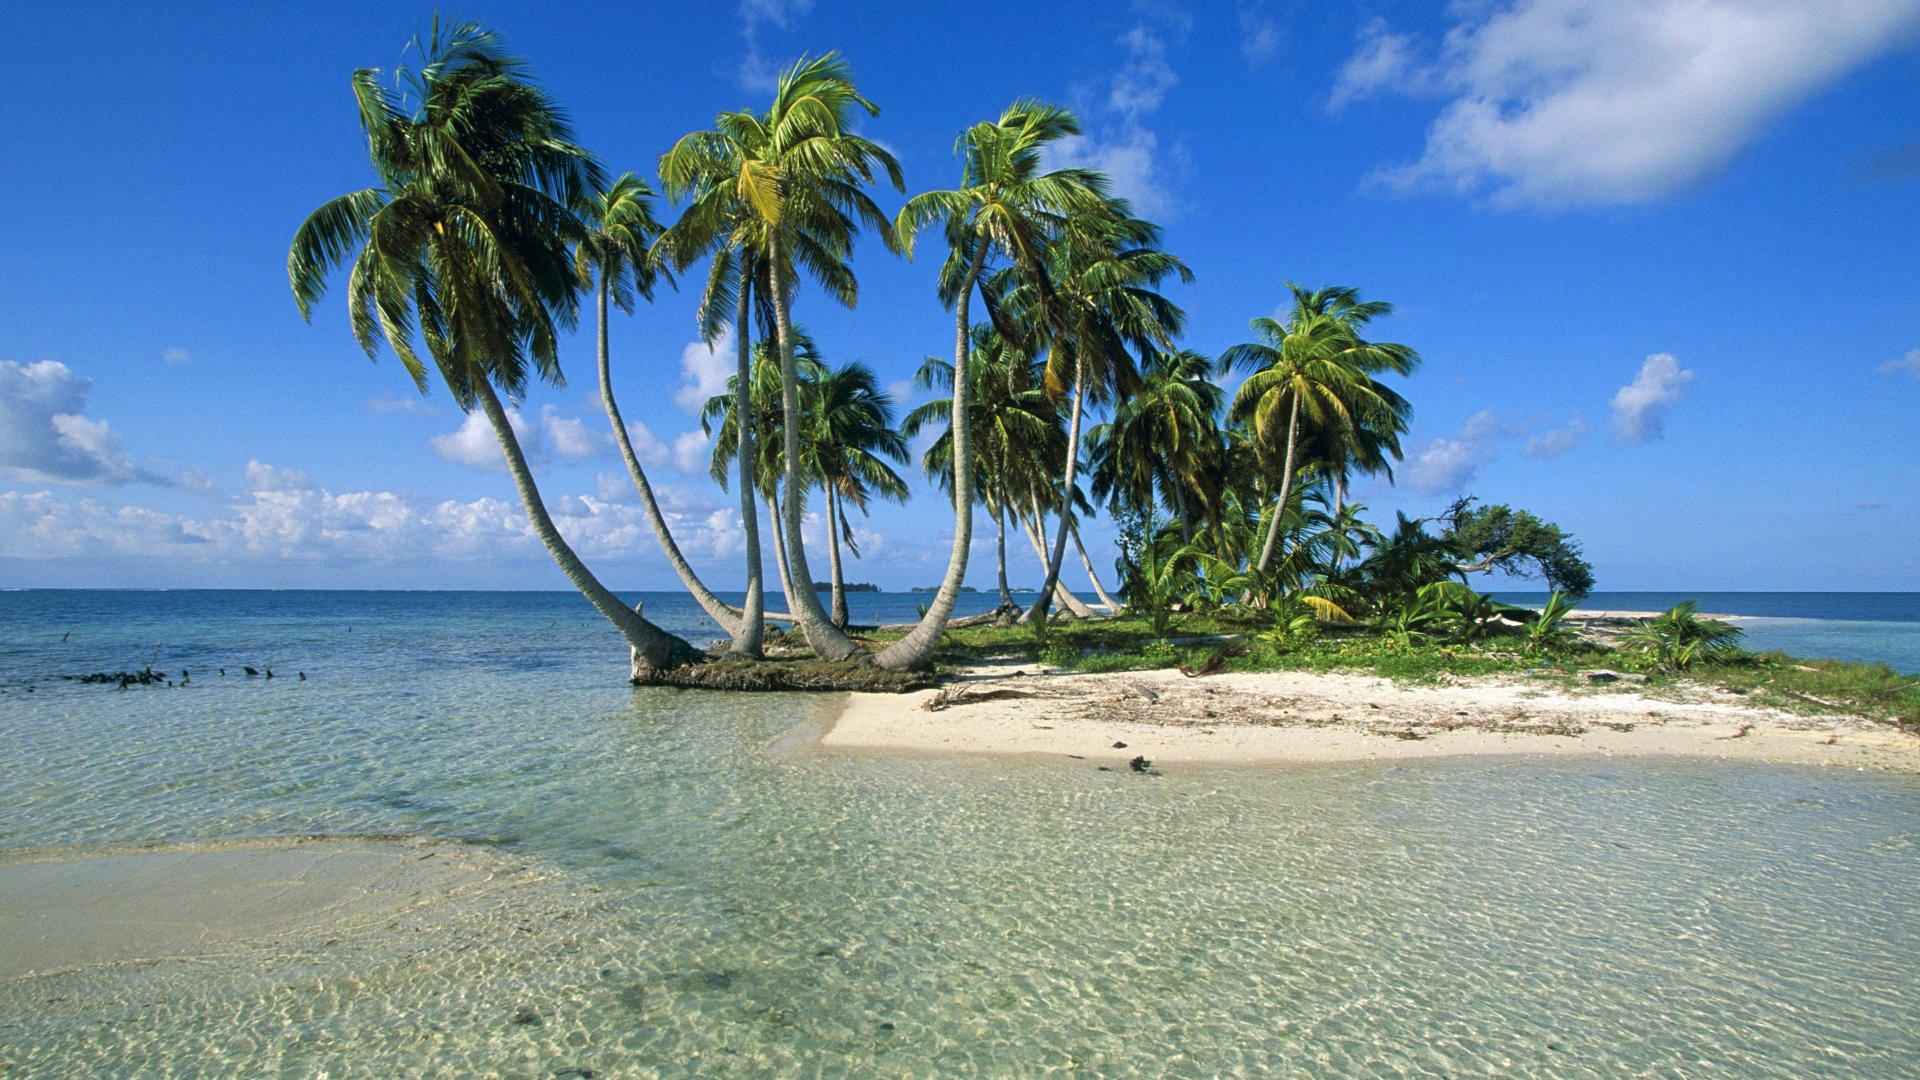 Photos of palm island